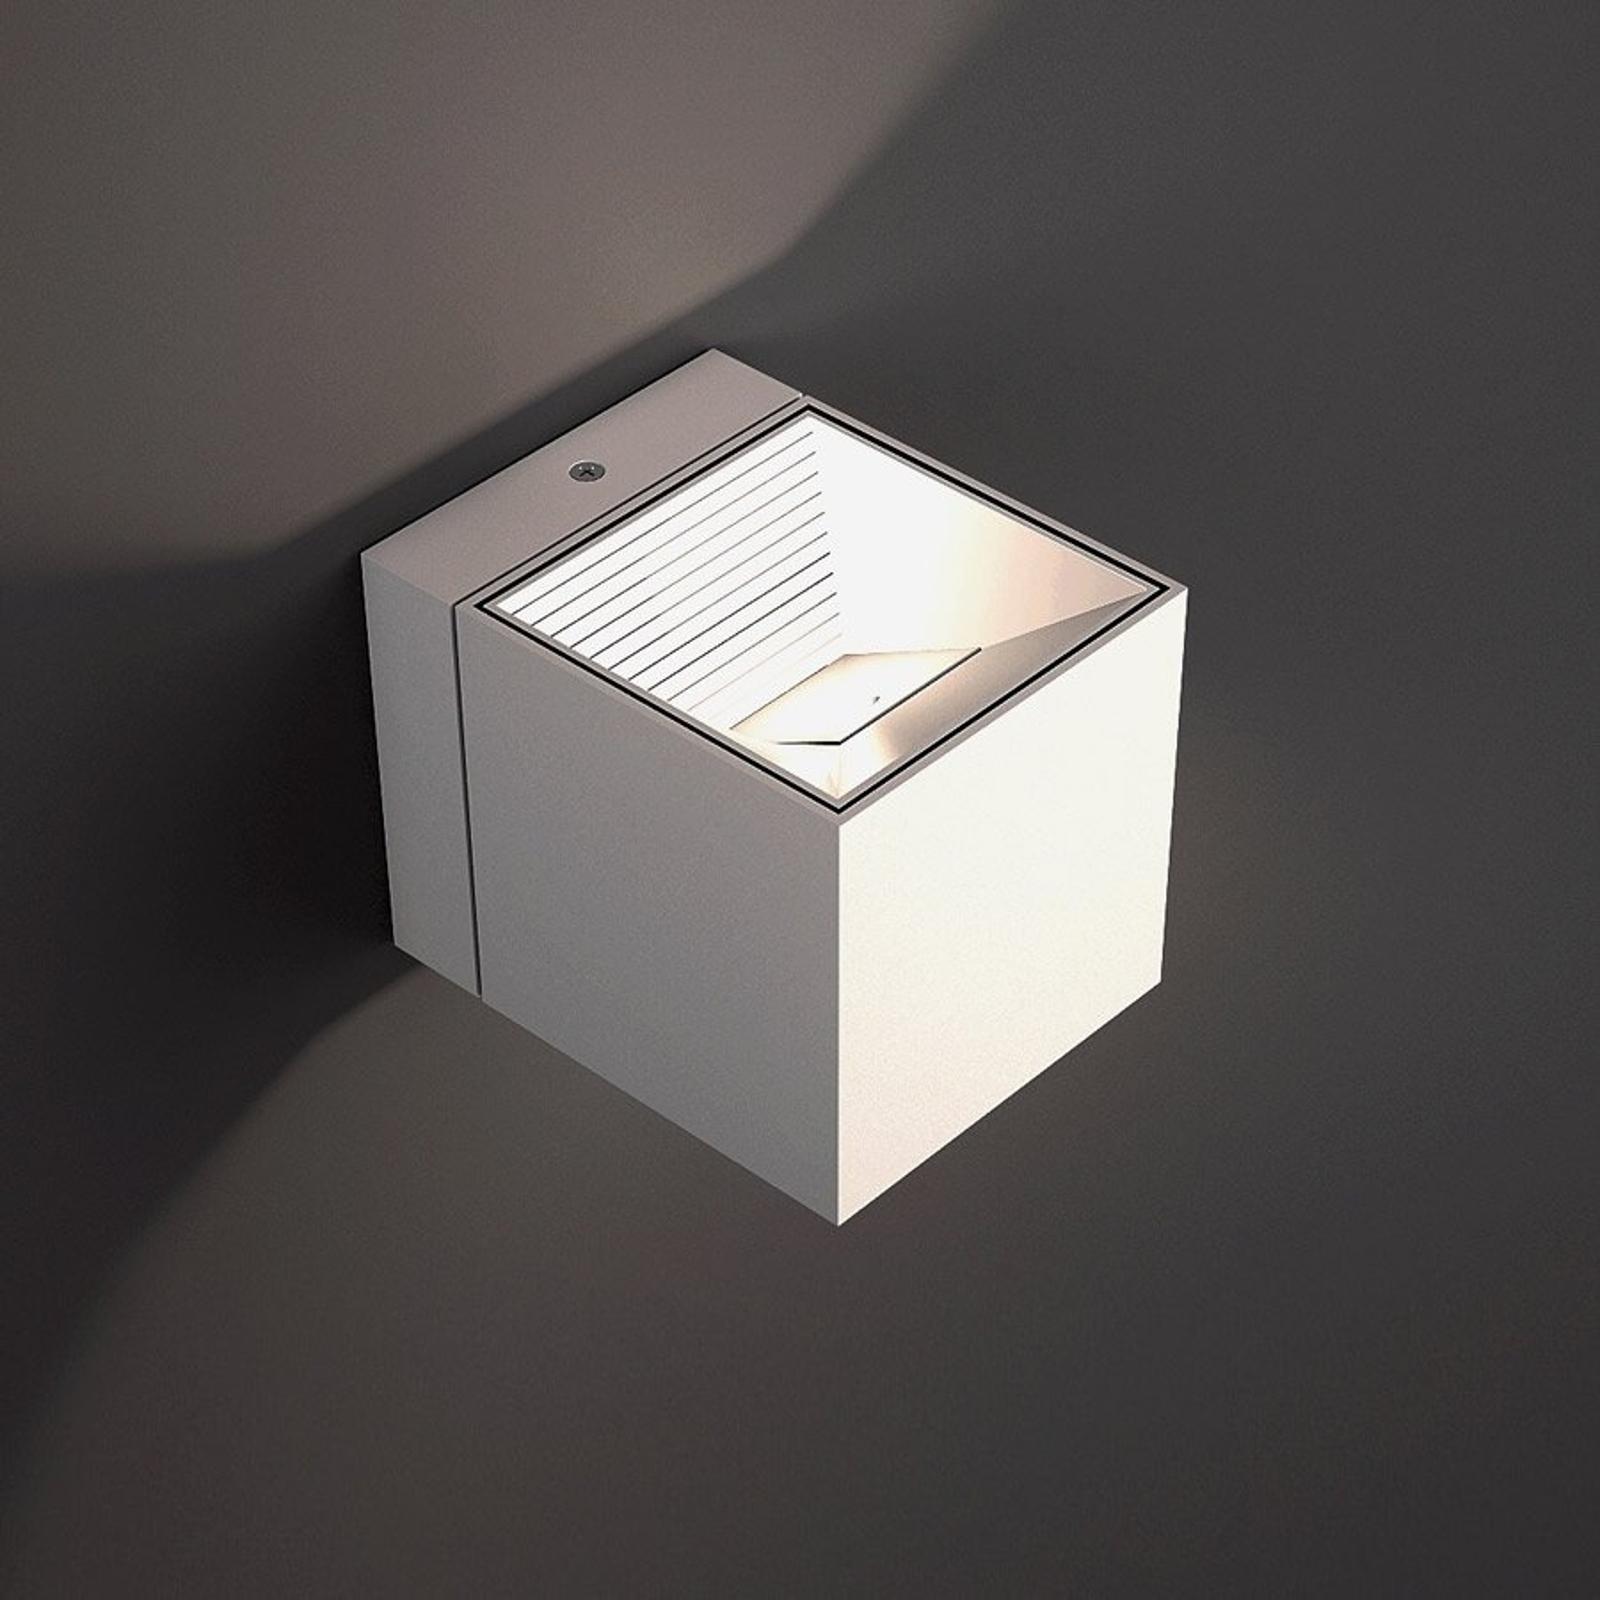 Milan Dau - LED-Wandleuchte in Weiß